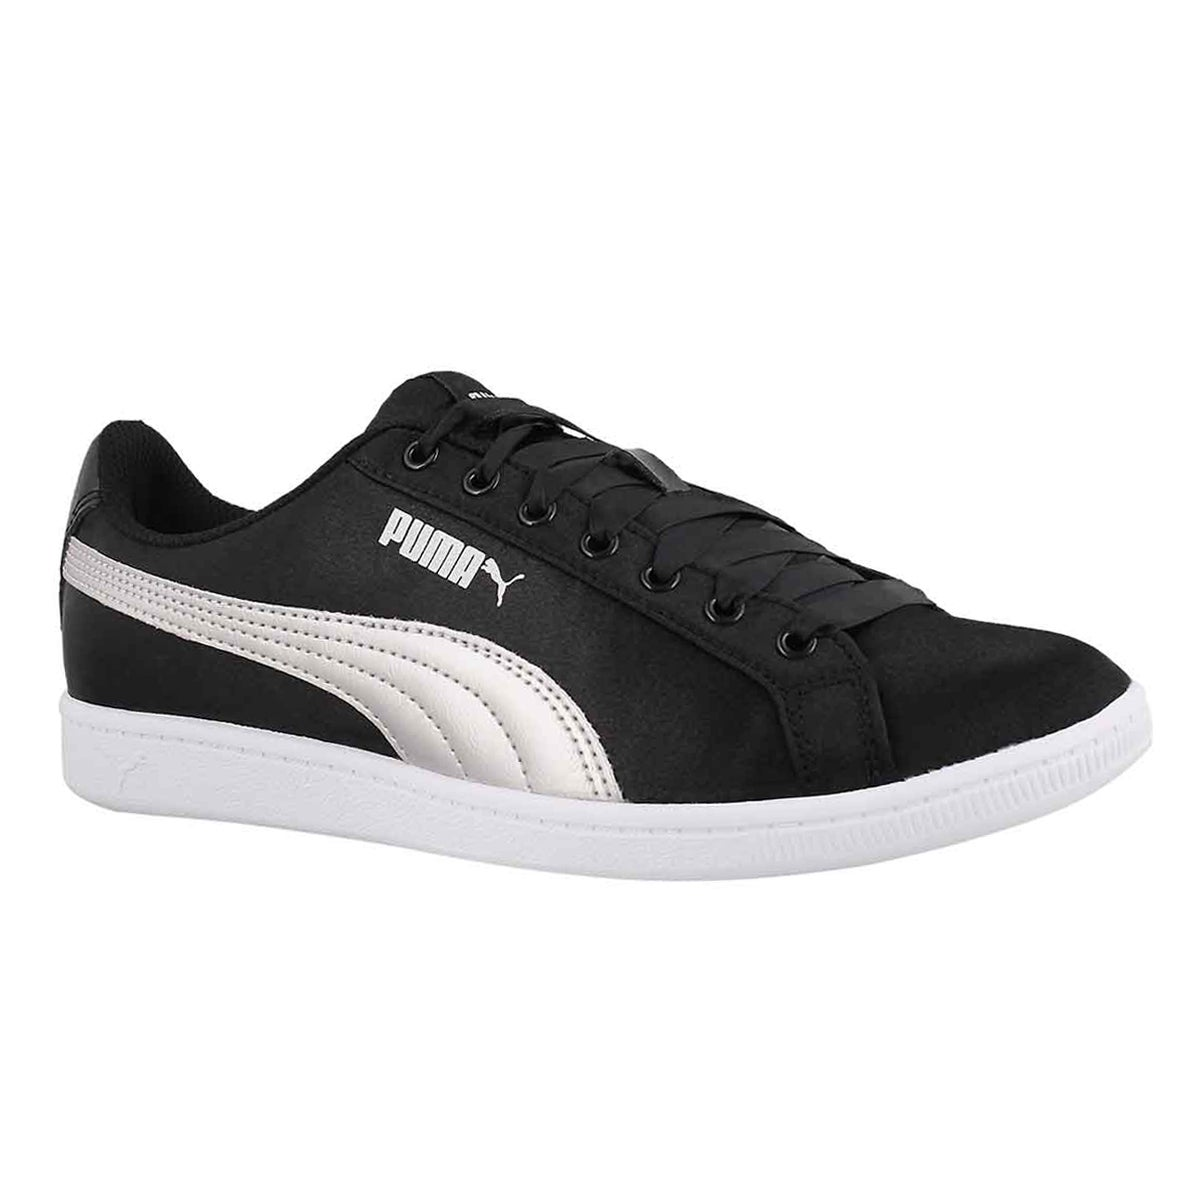 Women's PUMA VIKKY black/silver sneakers